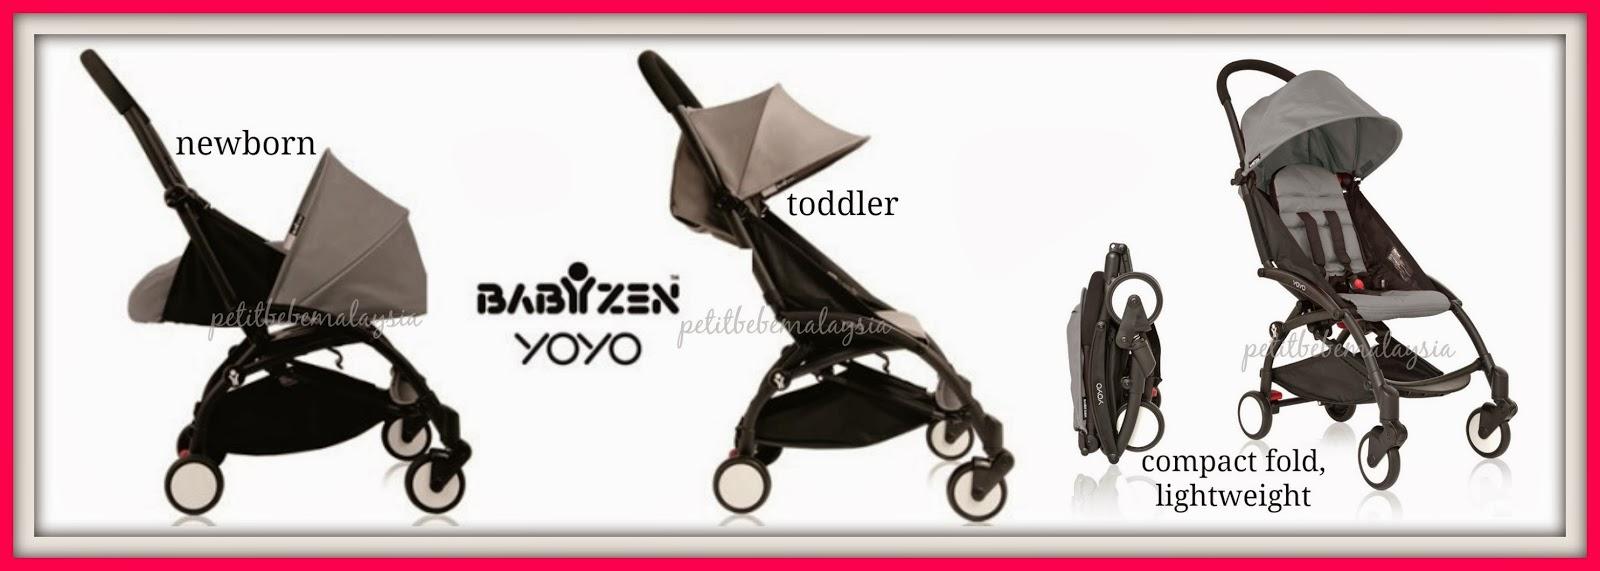 babyzen yoyo newborn 2014 preorder promo my petit bebe. Black Bedroom Furniture Sets. Home Design Ideas